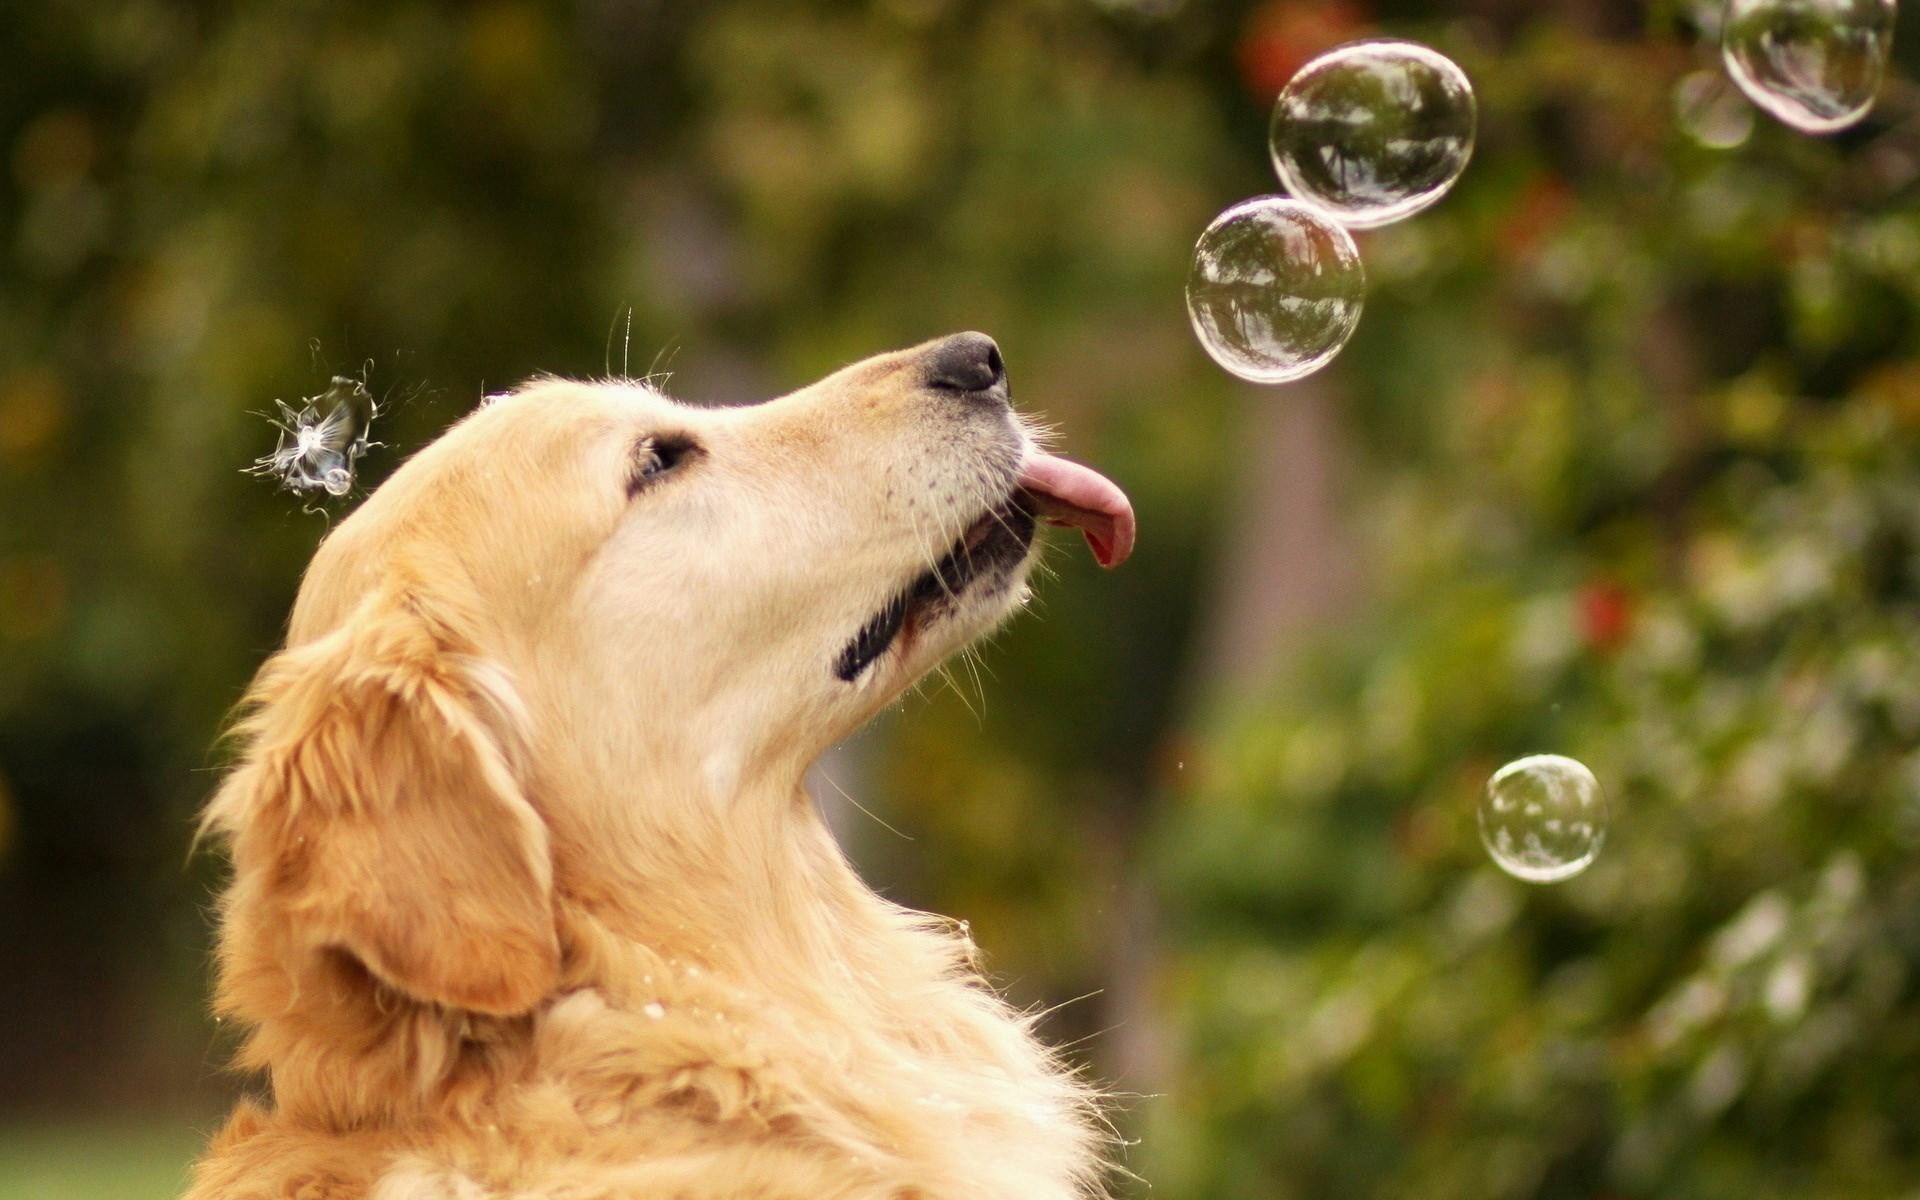 Dog-images-HD-background-wallpaper